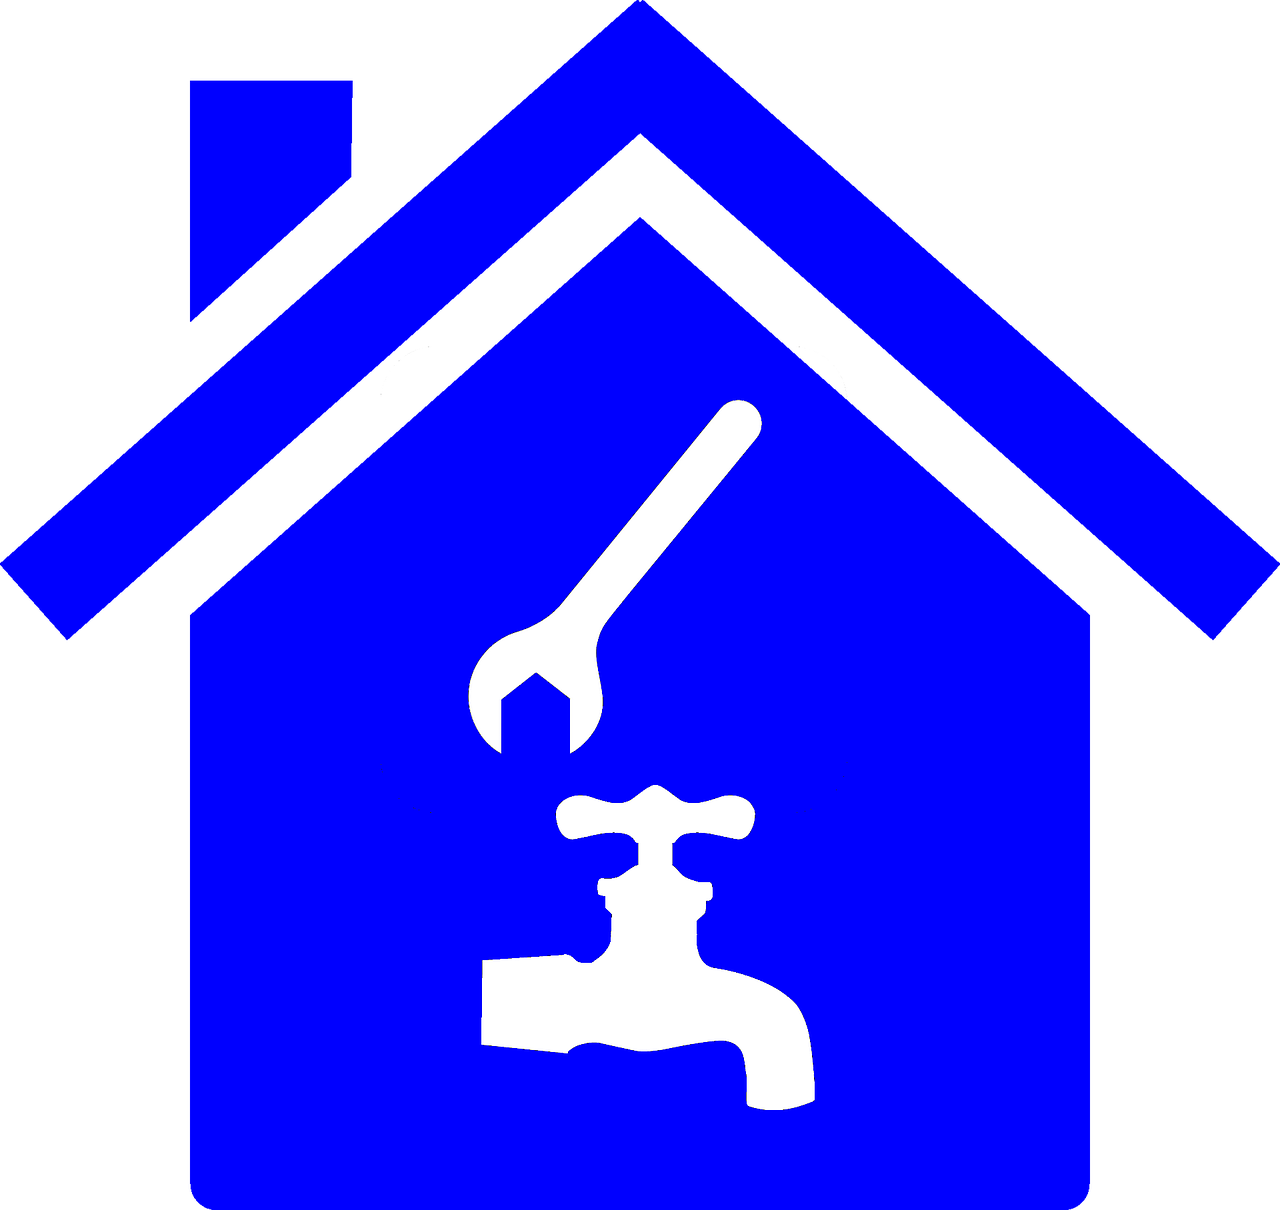 summertime plumbing